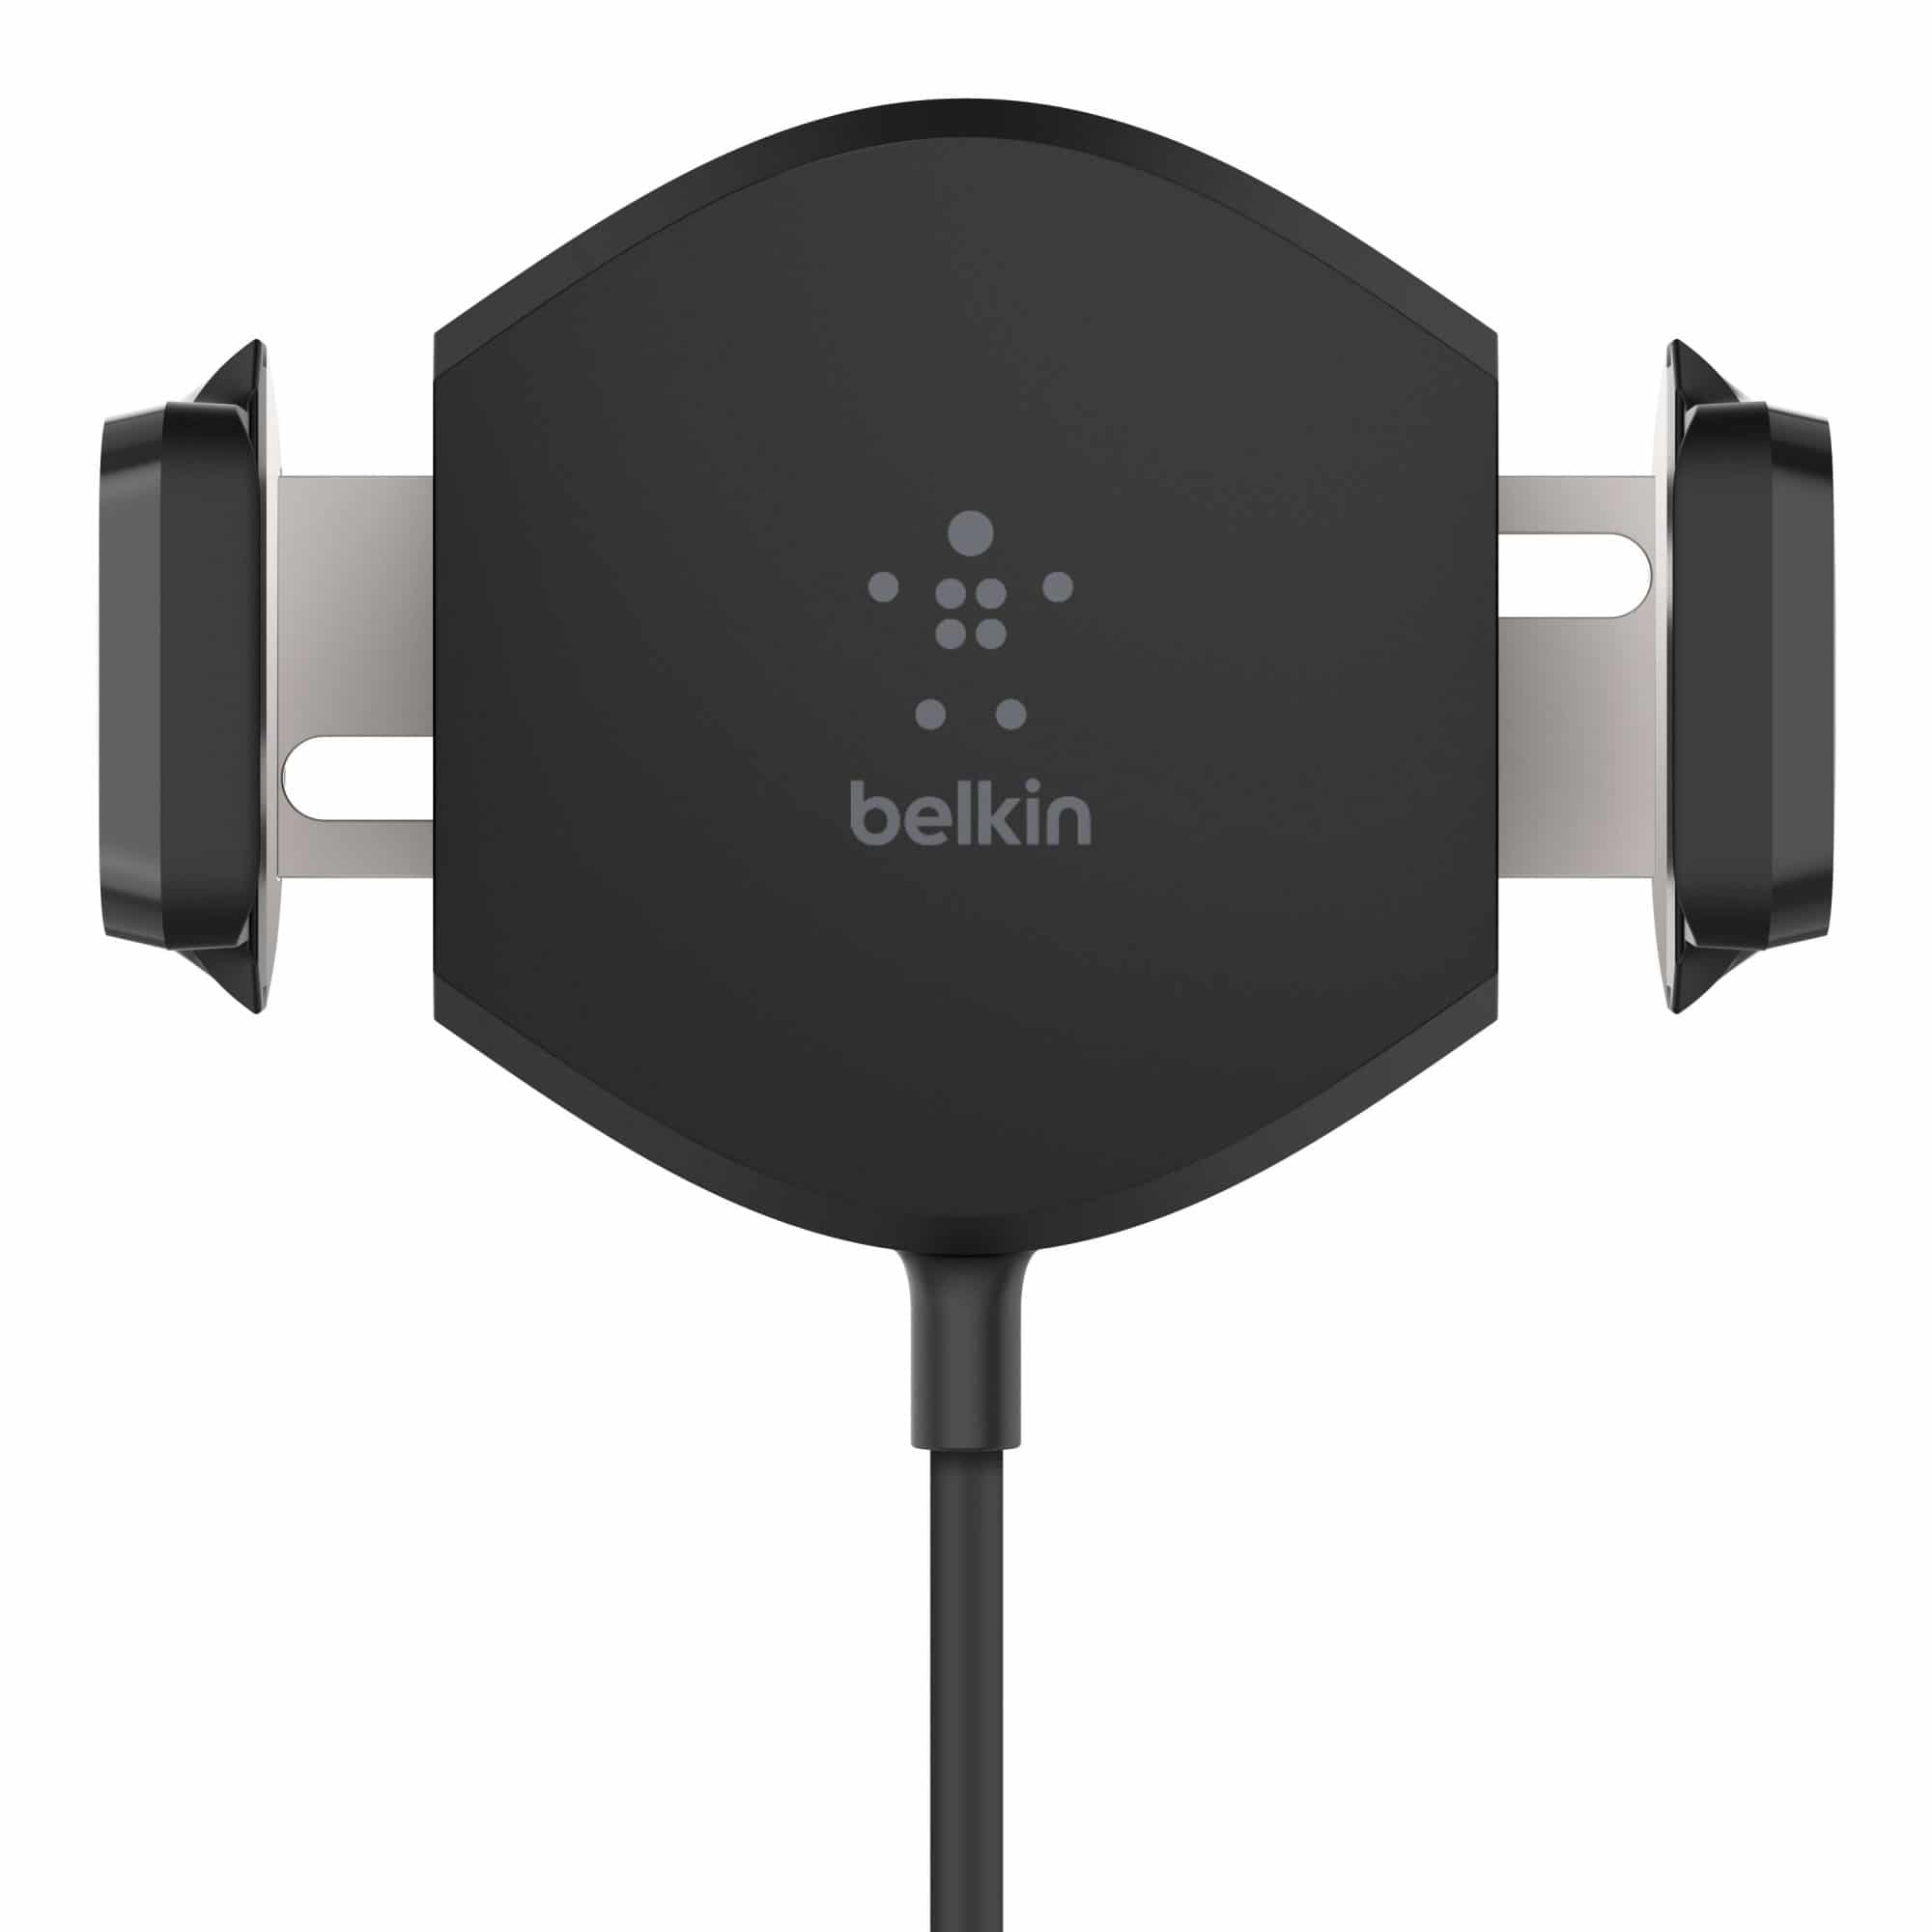 Belkin เพิ่ม 2 ผลิตภัณฑ์ในกลุ่ม BOOST↑CHARGE™ 8